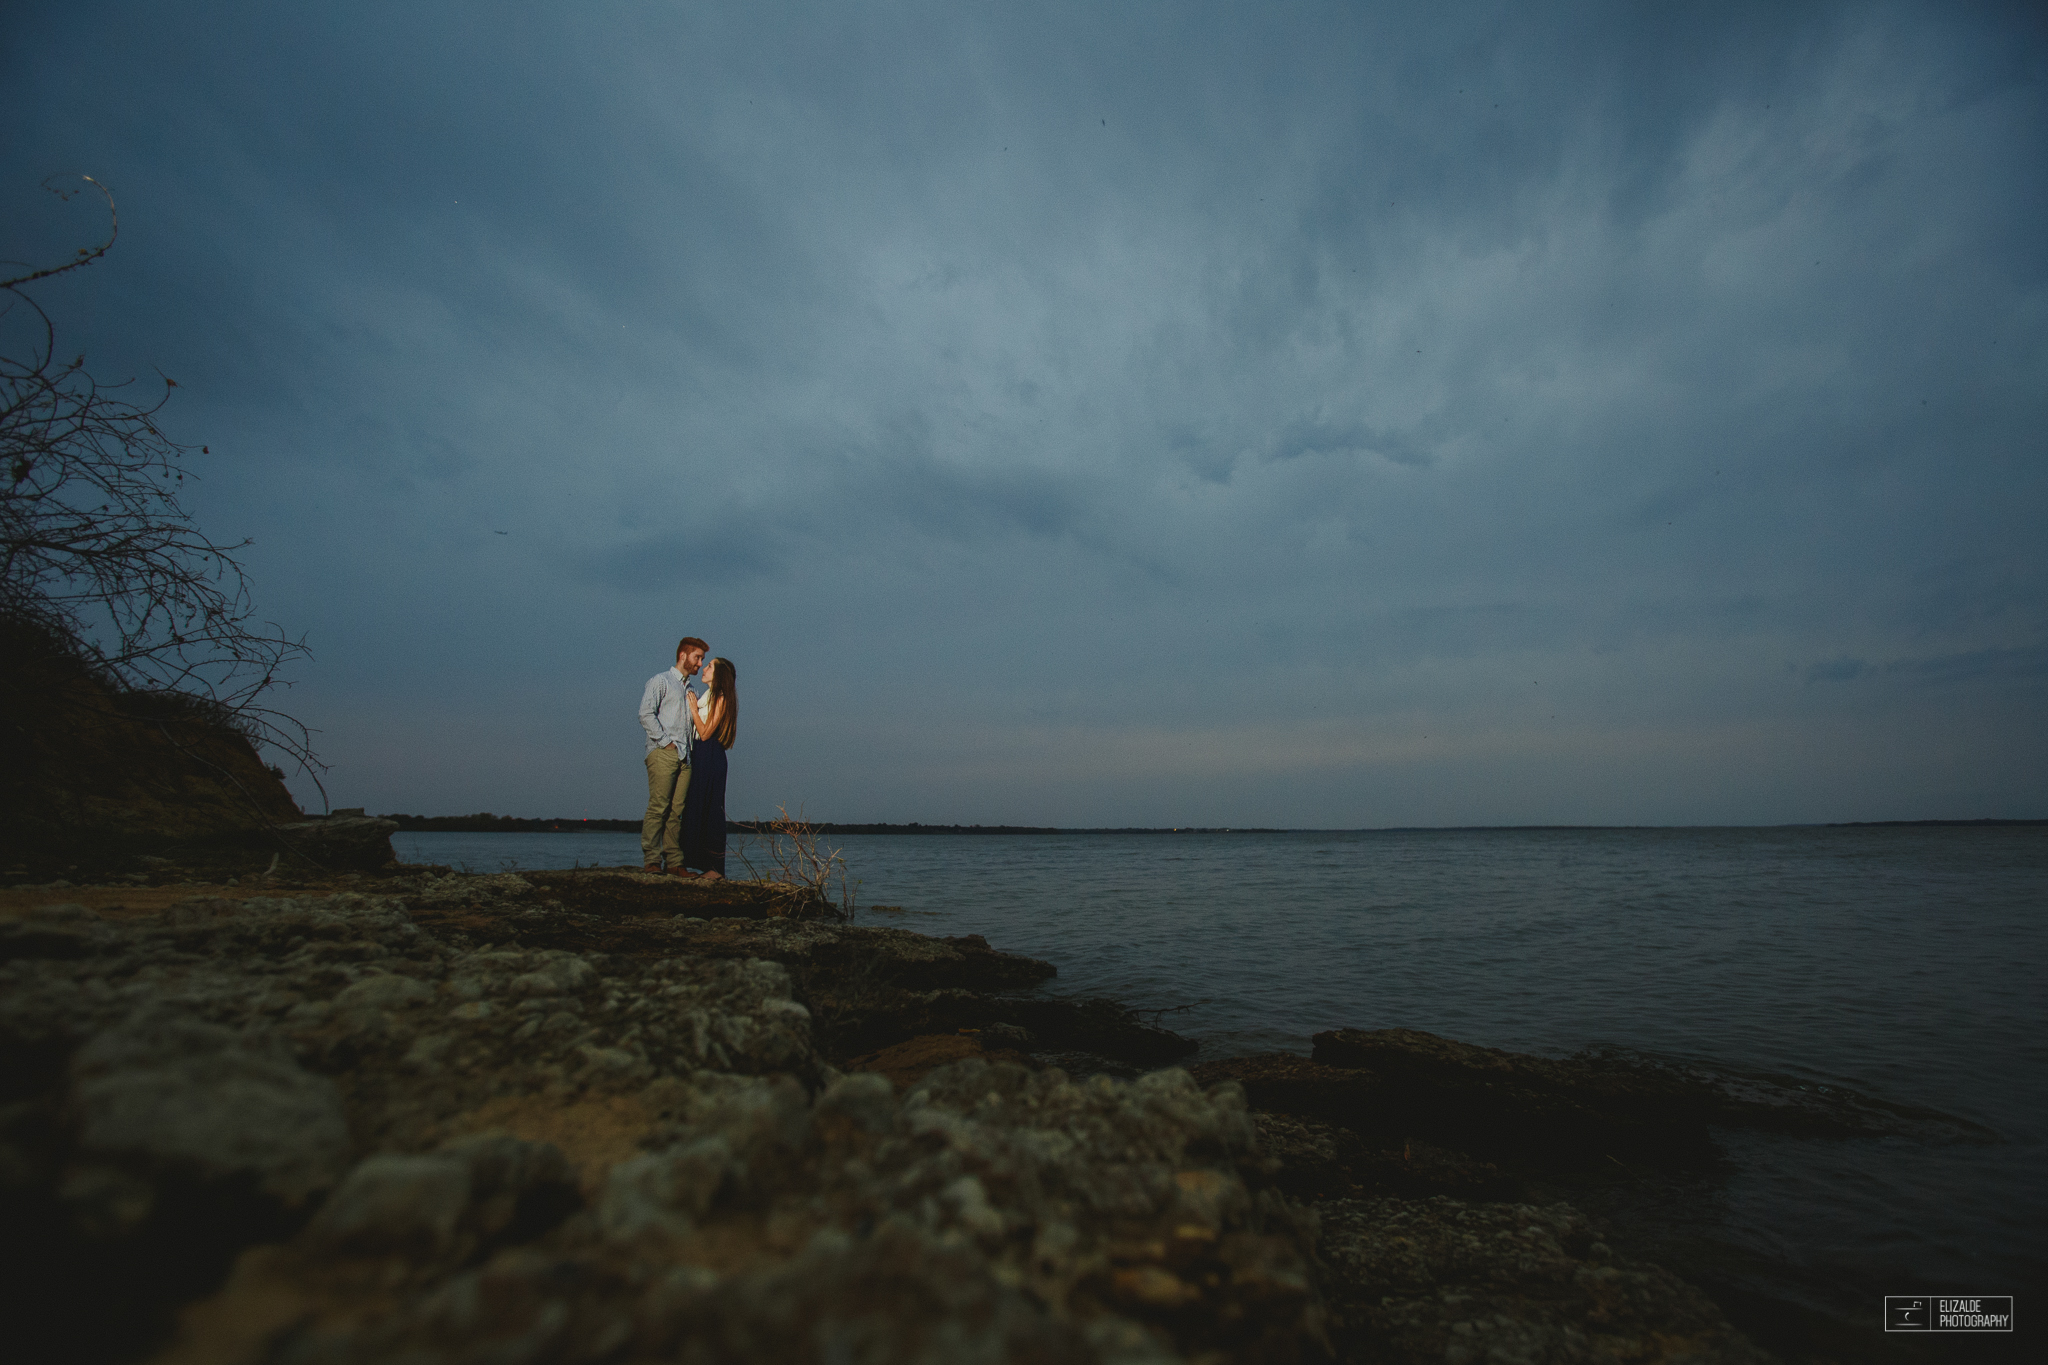 Engagement session_Engagement_Dallas photographer_Denton Photographer_elizalde photography_DFW wedding photographer_wedding (22 of 24).jpg